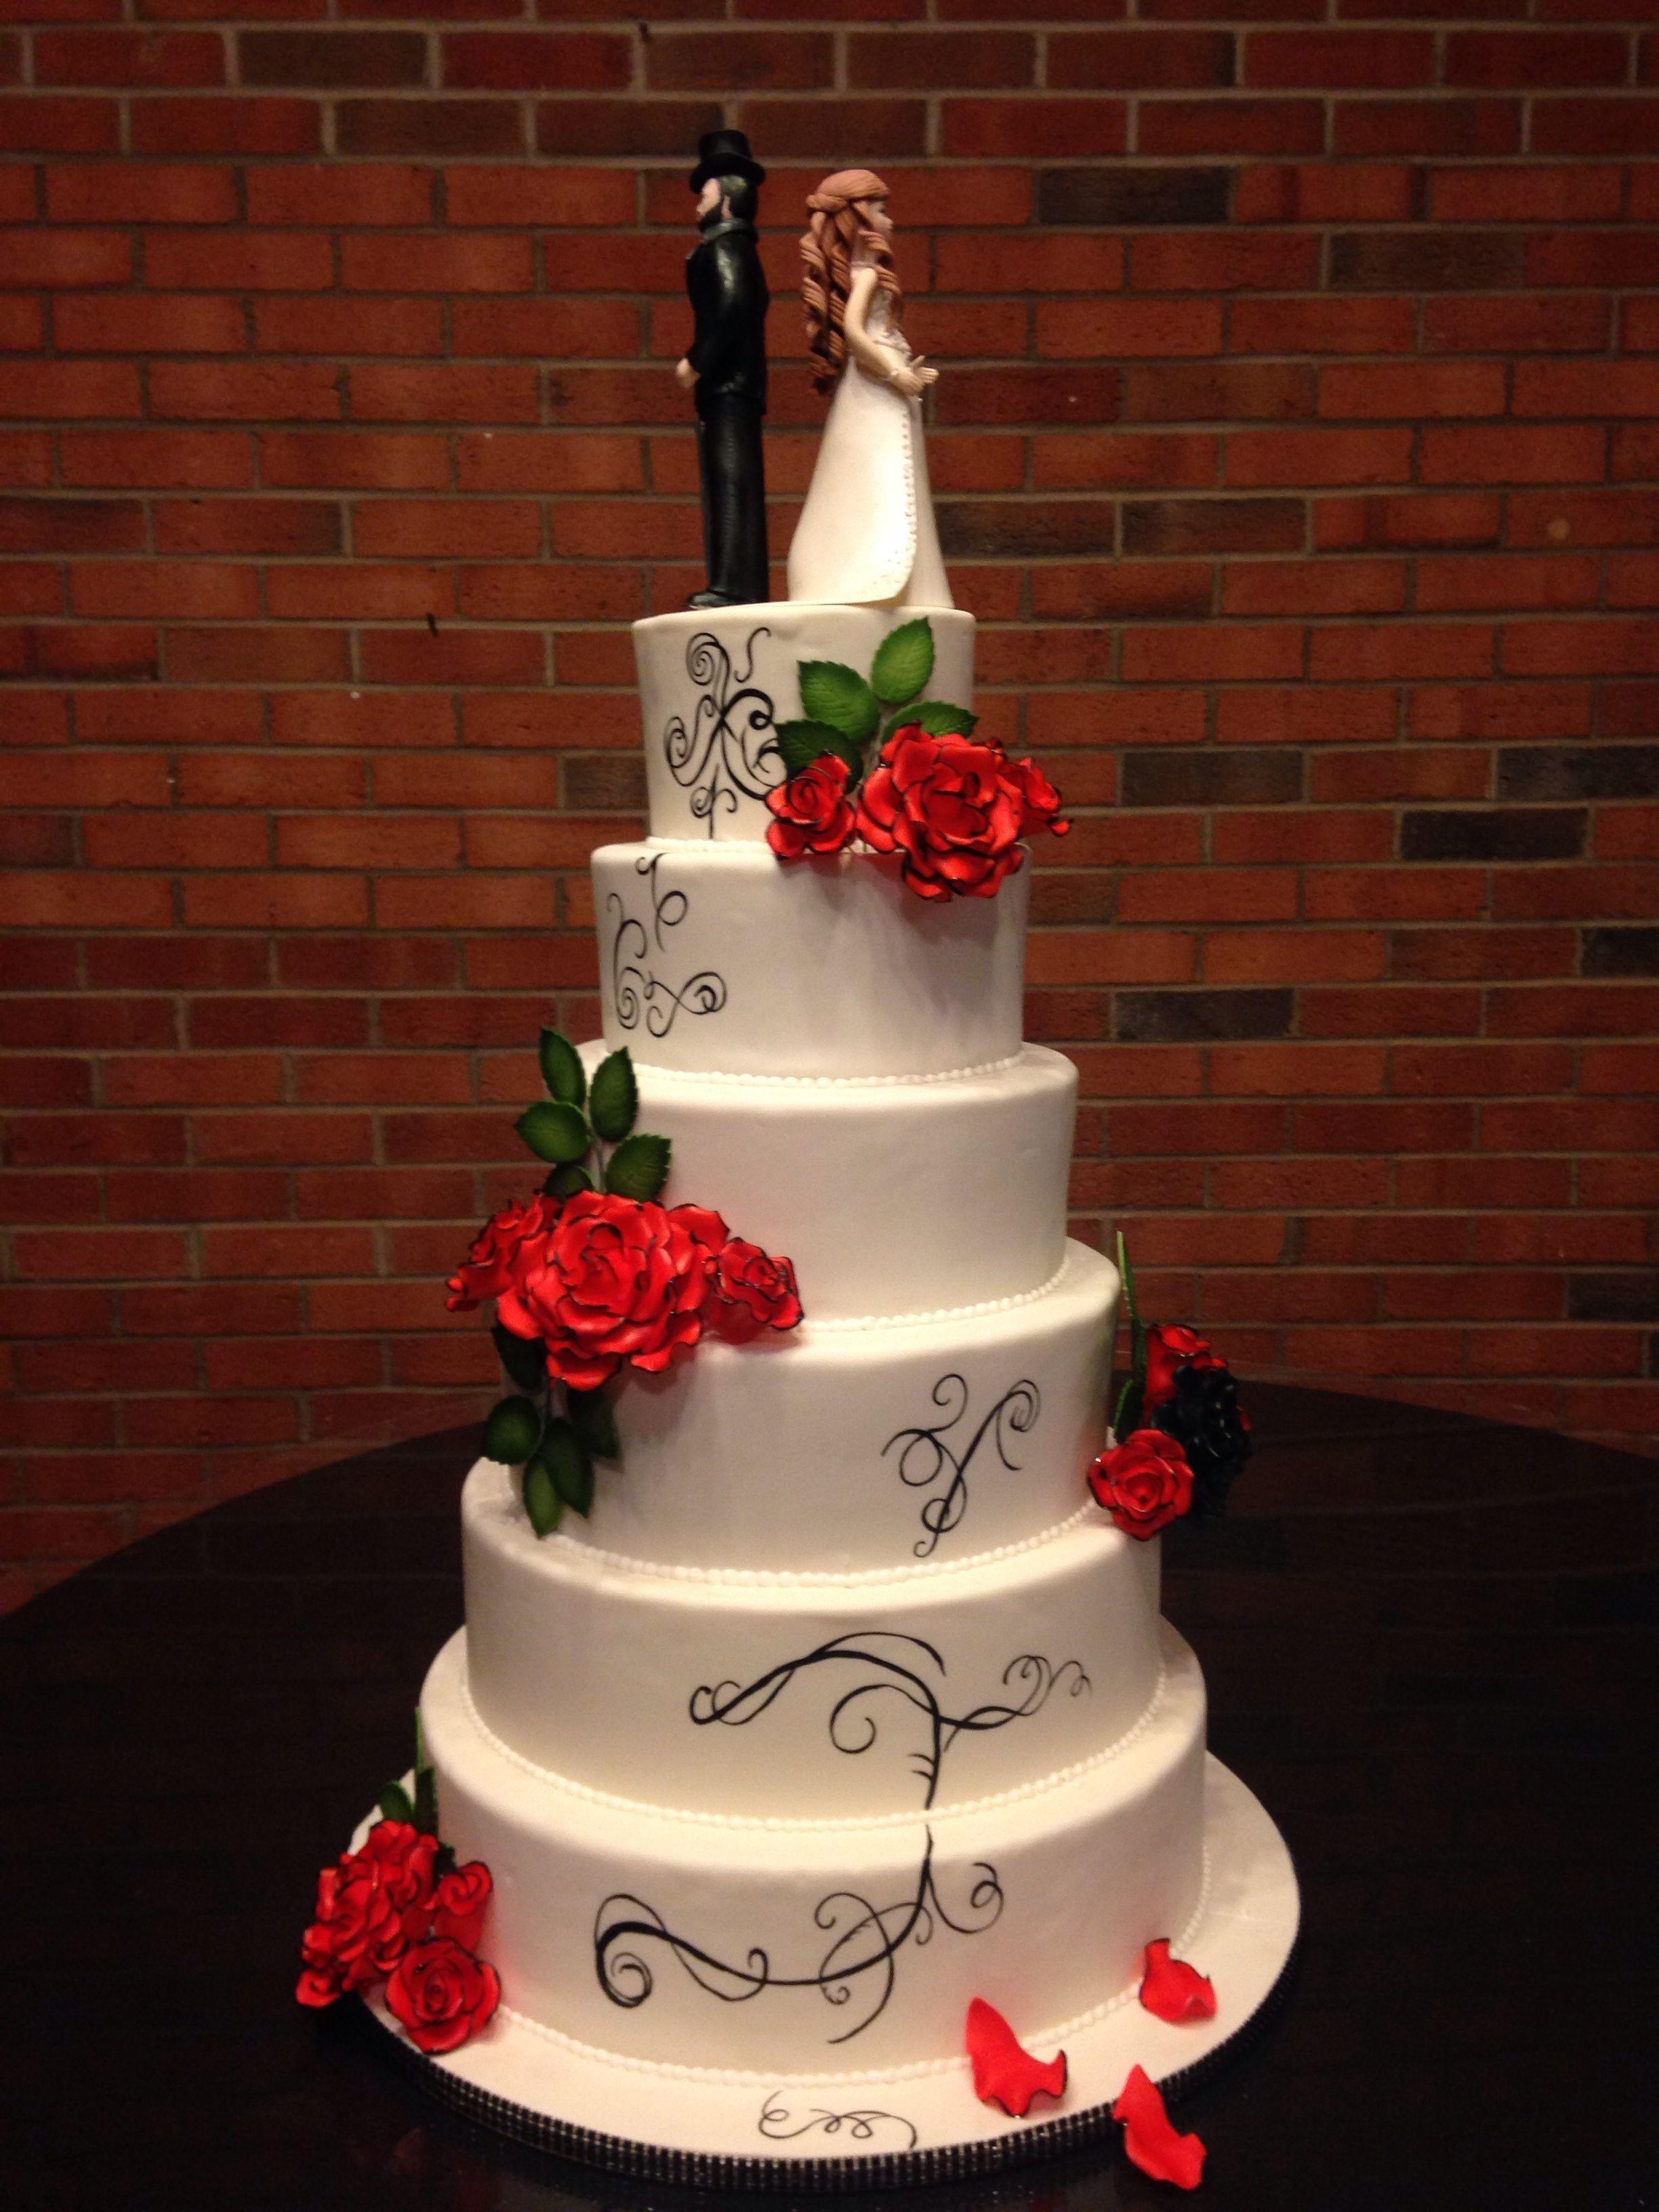 Zombie Wedding Cakes  Zombie Wedding Cake CakeCentral